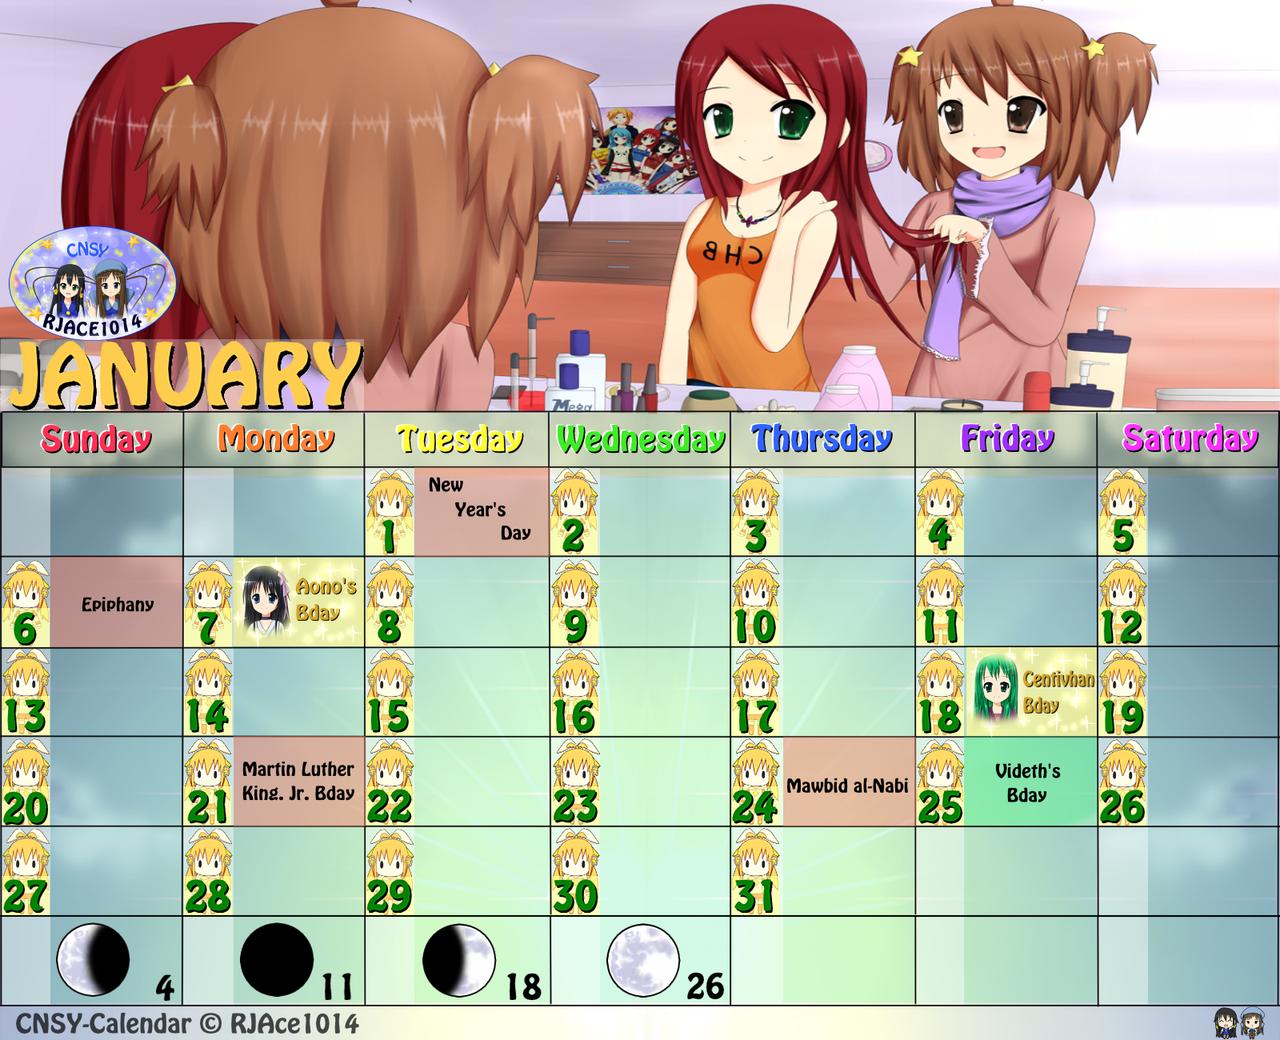 CNSY Calendar - January by RJAce1014